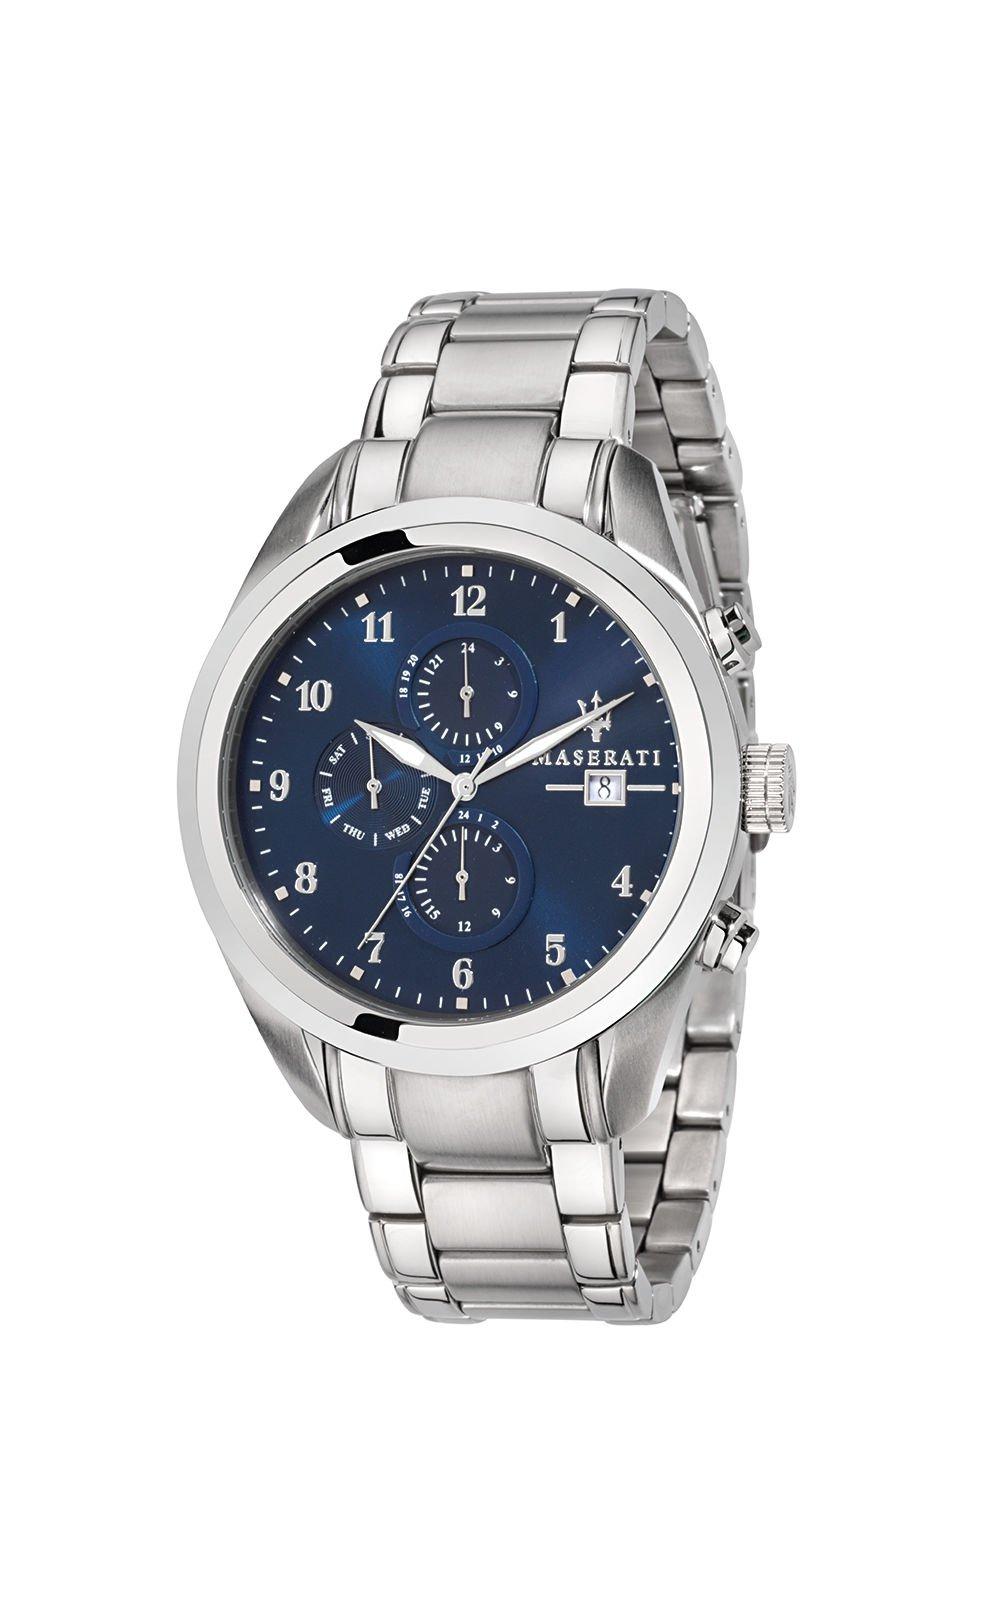 MASERATI R8853112505 Ανδρικό Ρολόι Quartz Χρονογράφος Ακριβείας